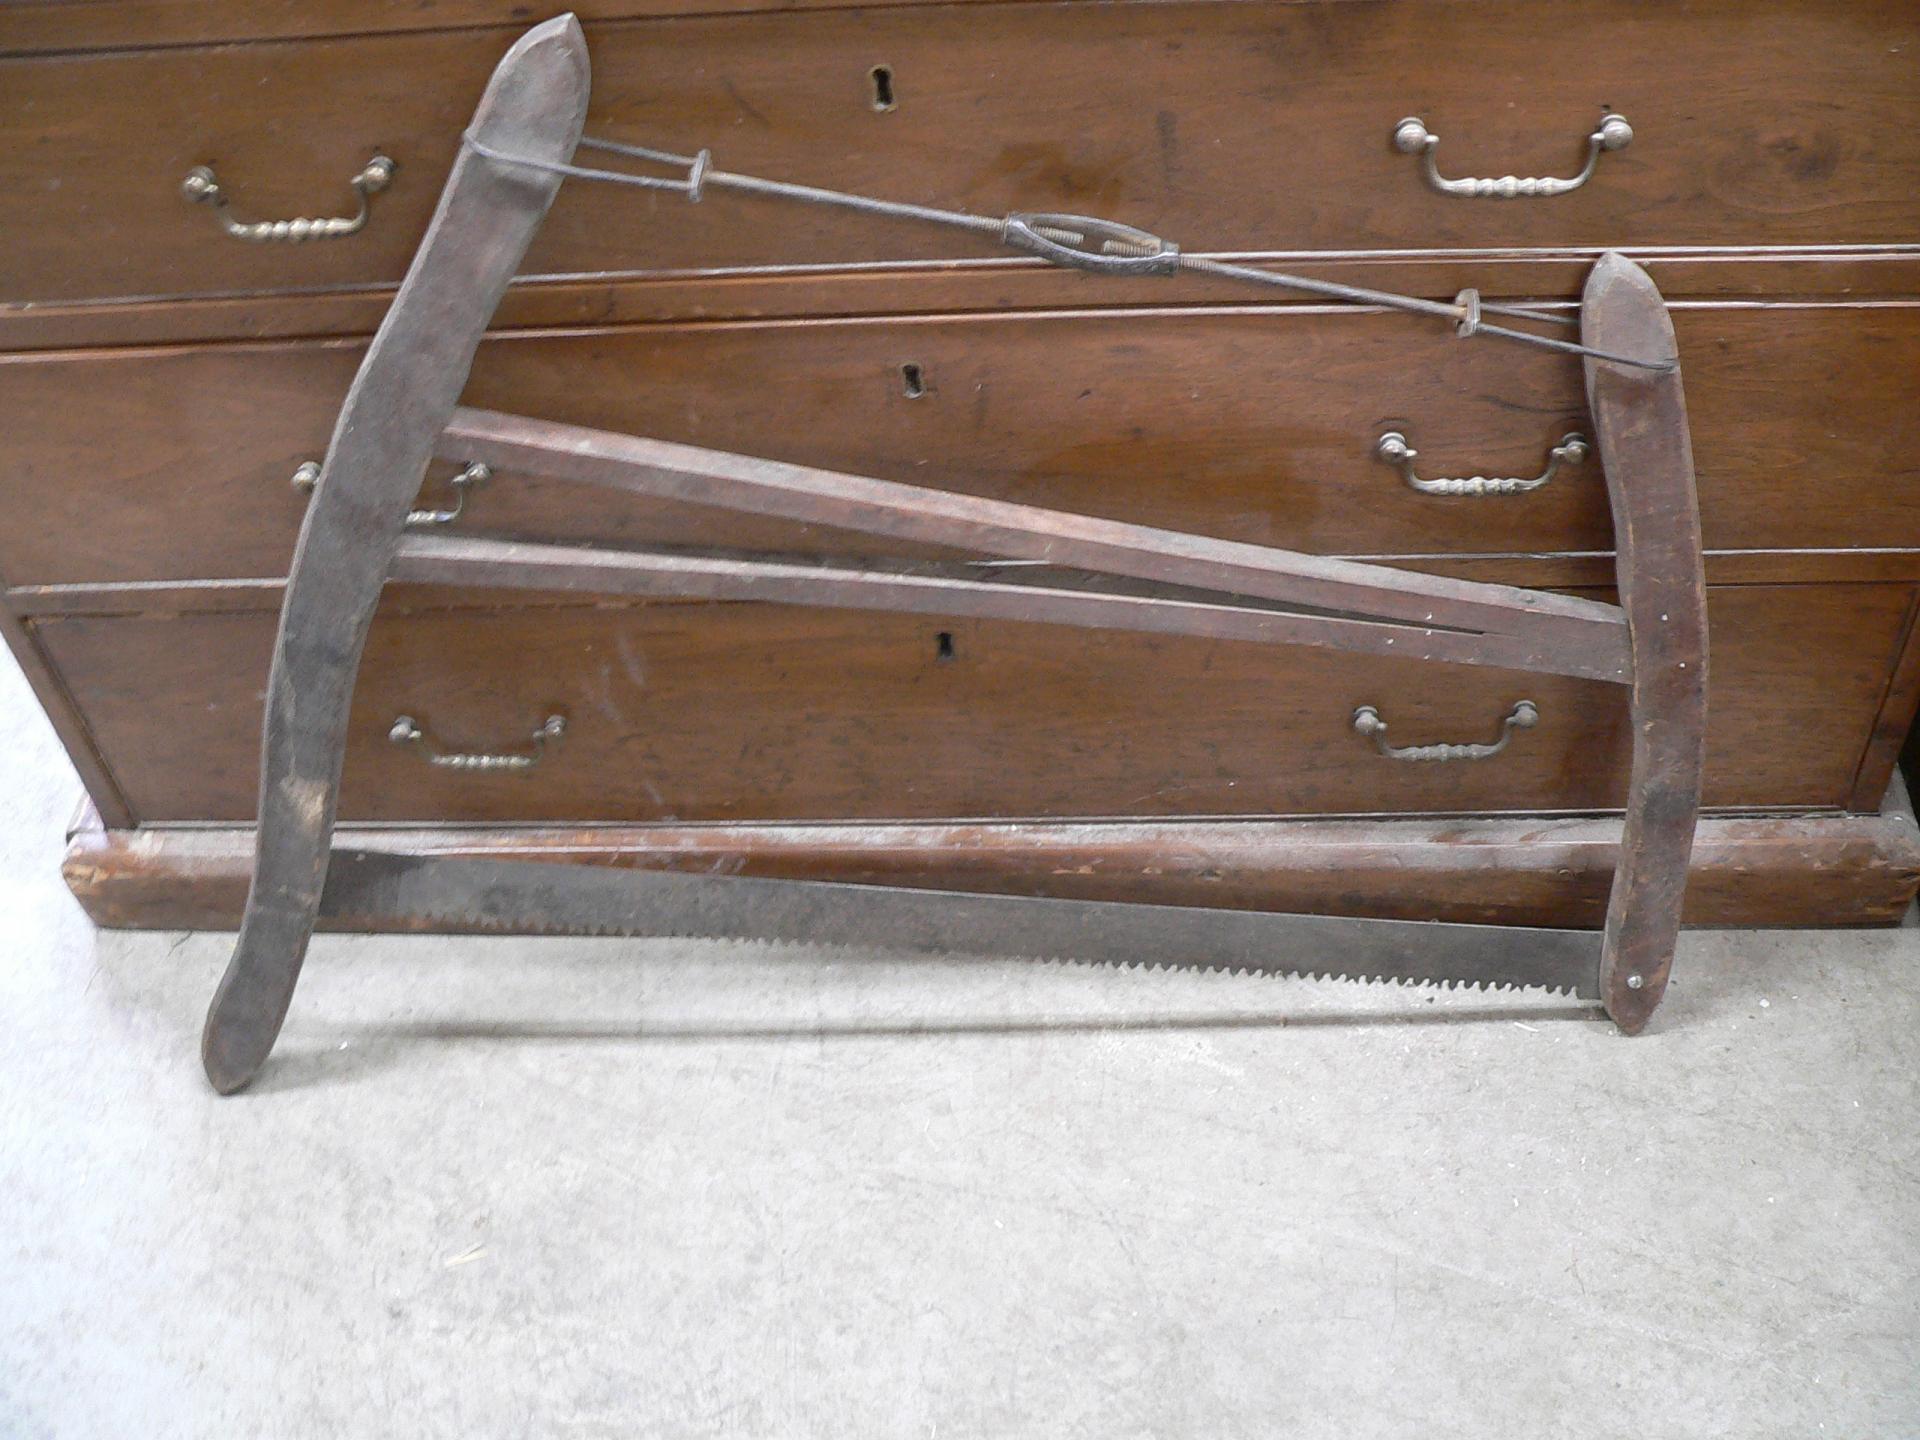 Belle scie st-joseph antique # 5140